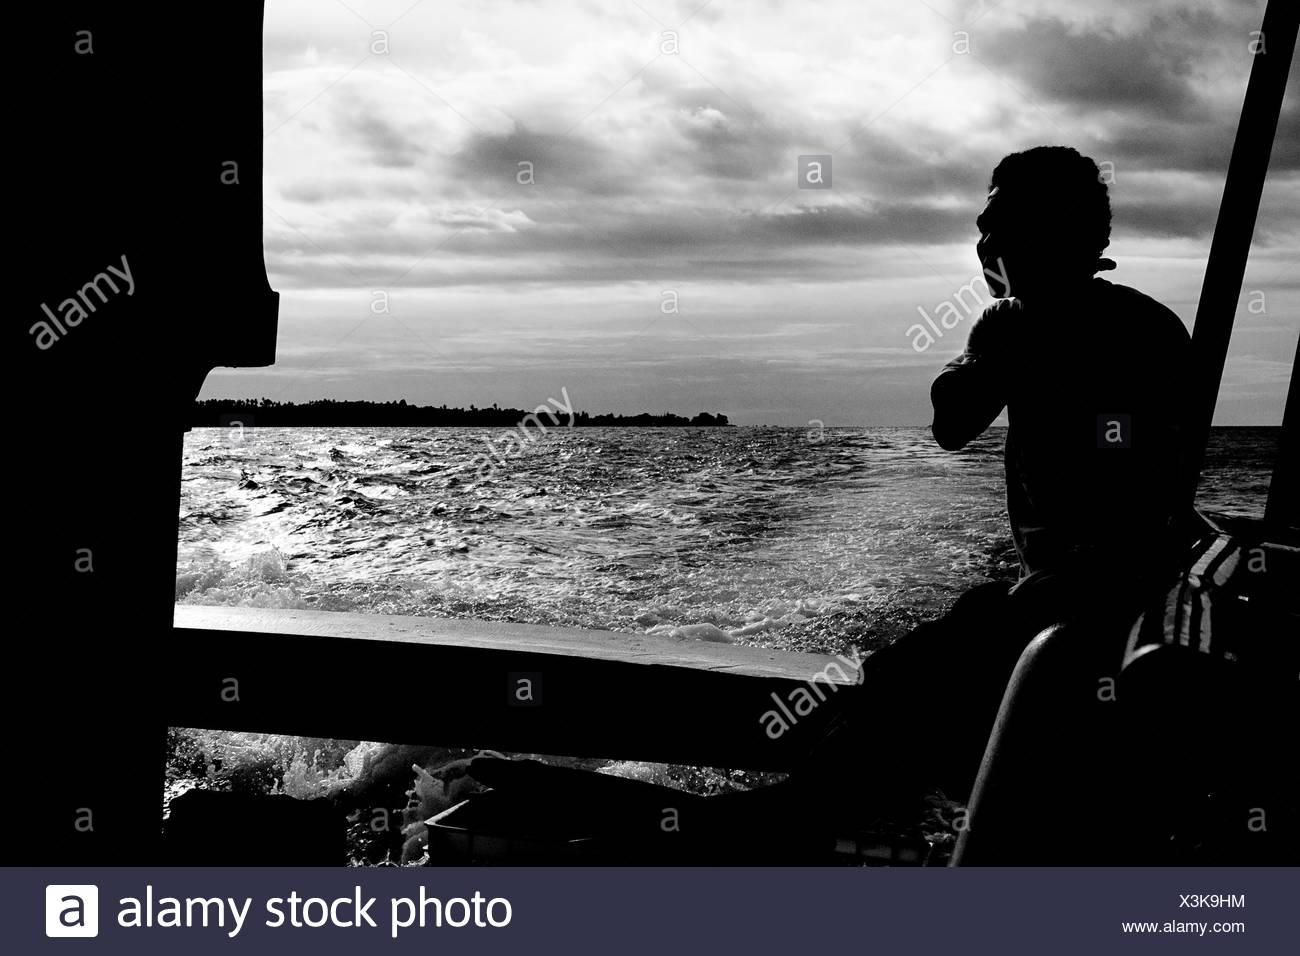 Fisherman, Sulawesi, Indonesia - Stock Image